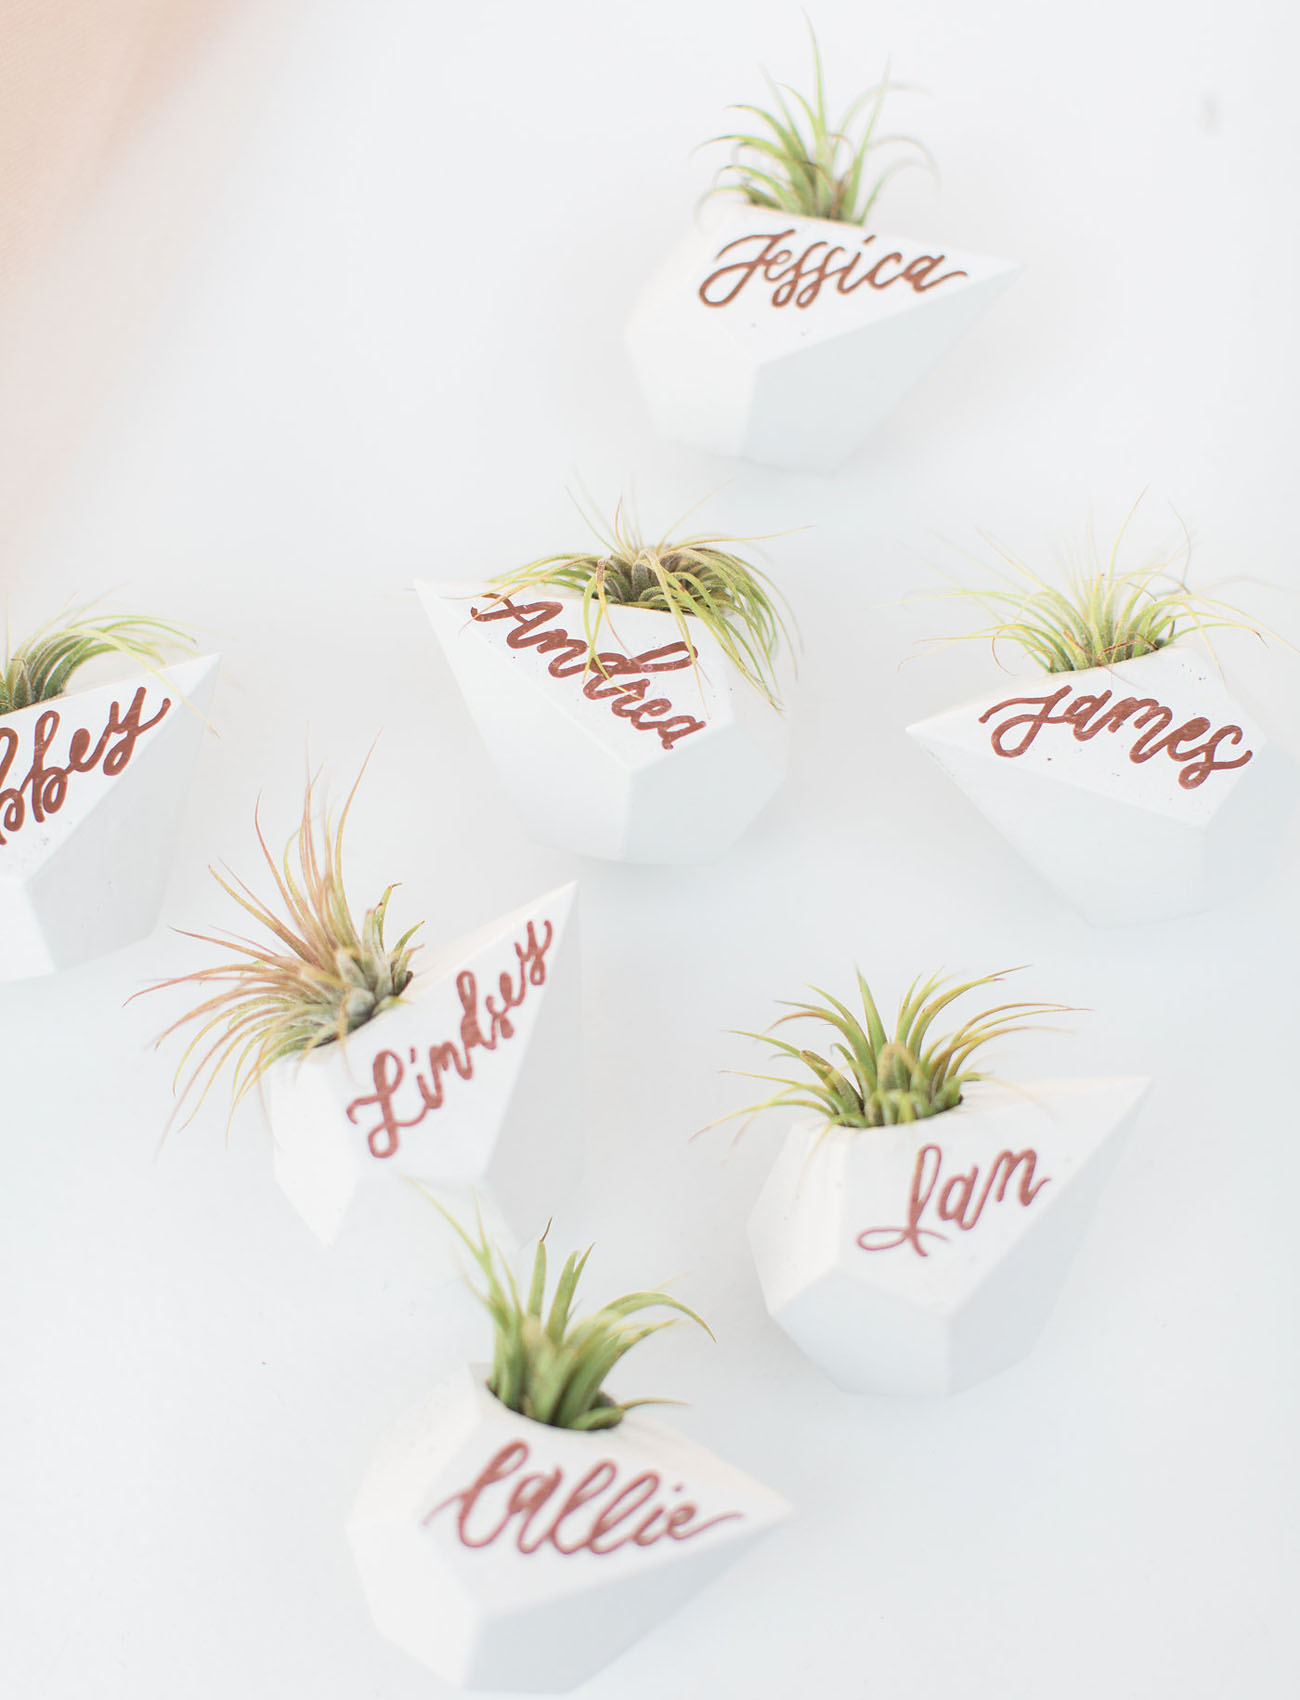 cactus name cards